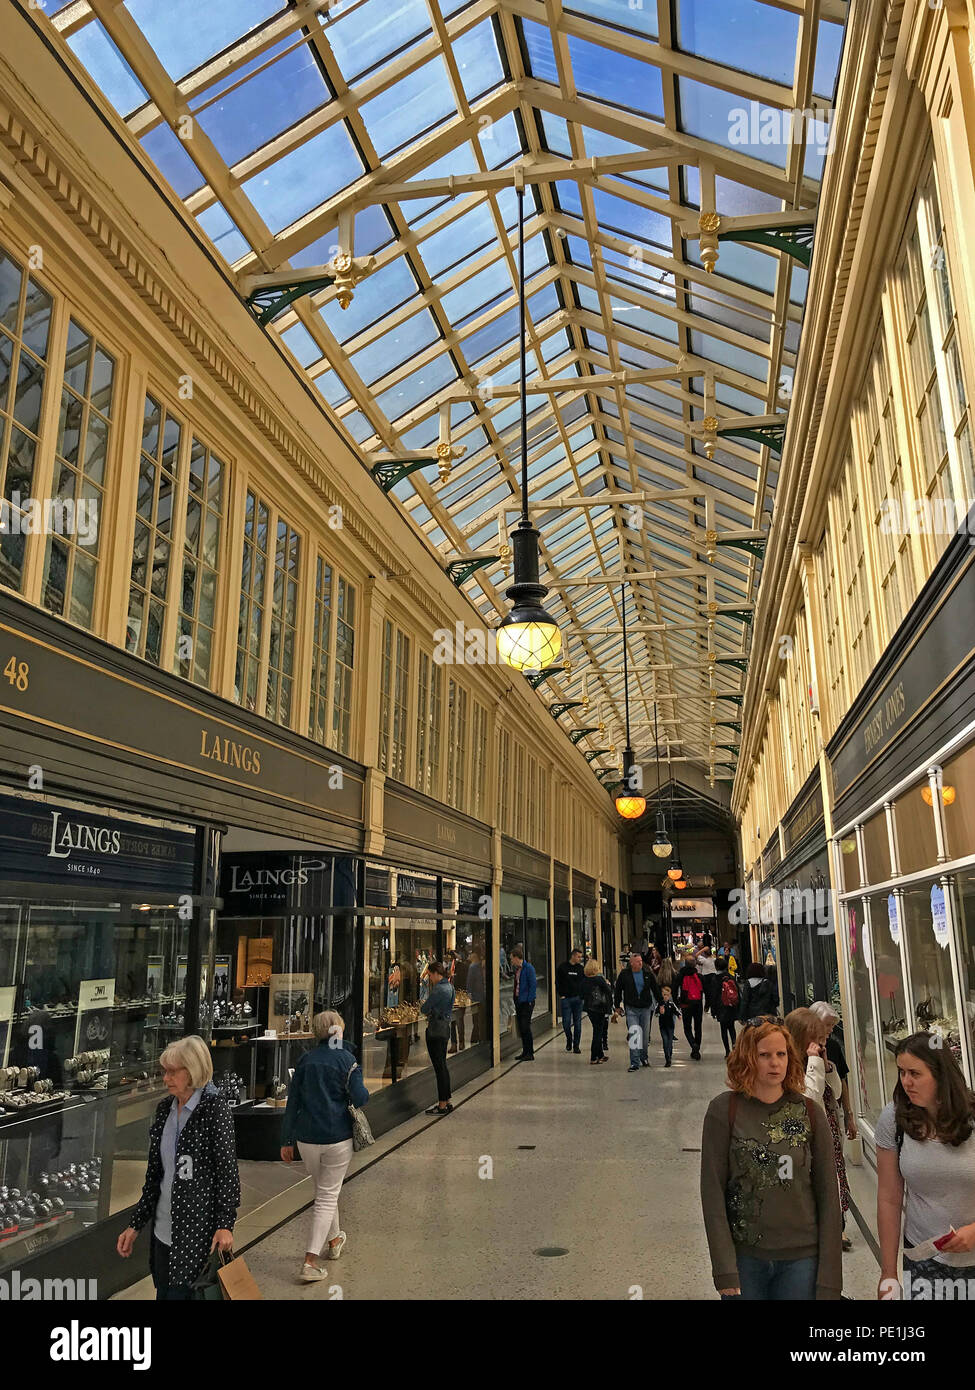 GoTonySmith @HotpixUK,GoTonySmith,@HotpixUK,Strathcylde,UK,Arcade,city centre,GB,shopping,retail,Victorian,shop,retailing,roof,canopy,light,lighting